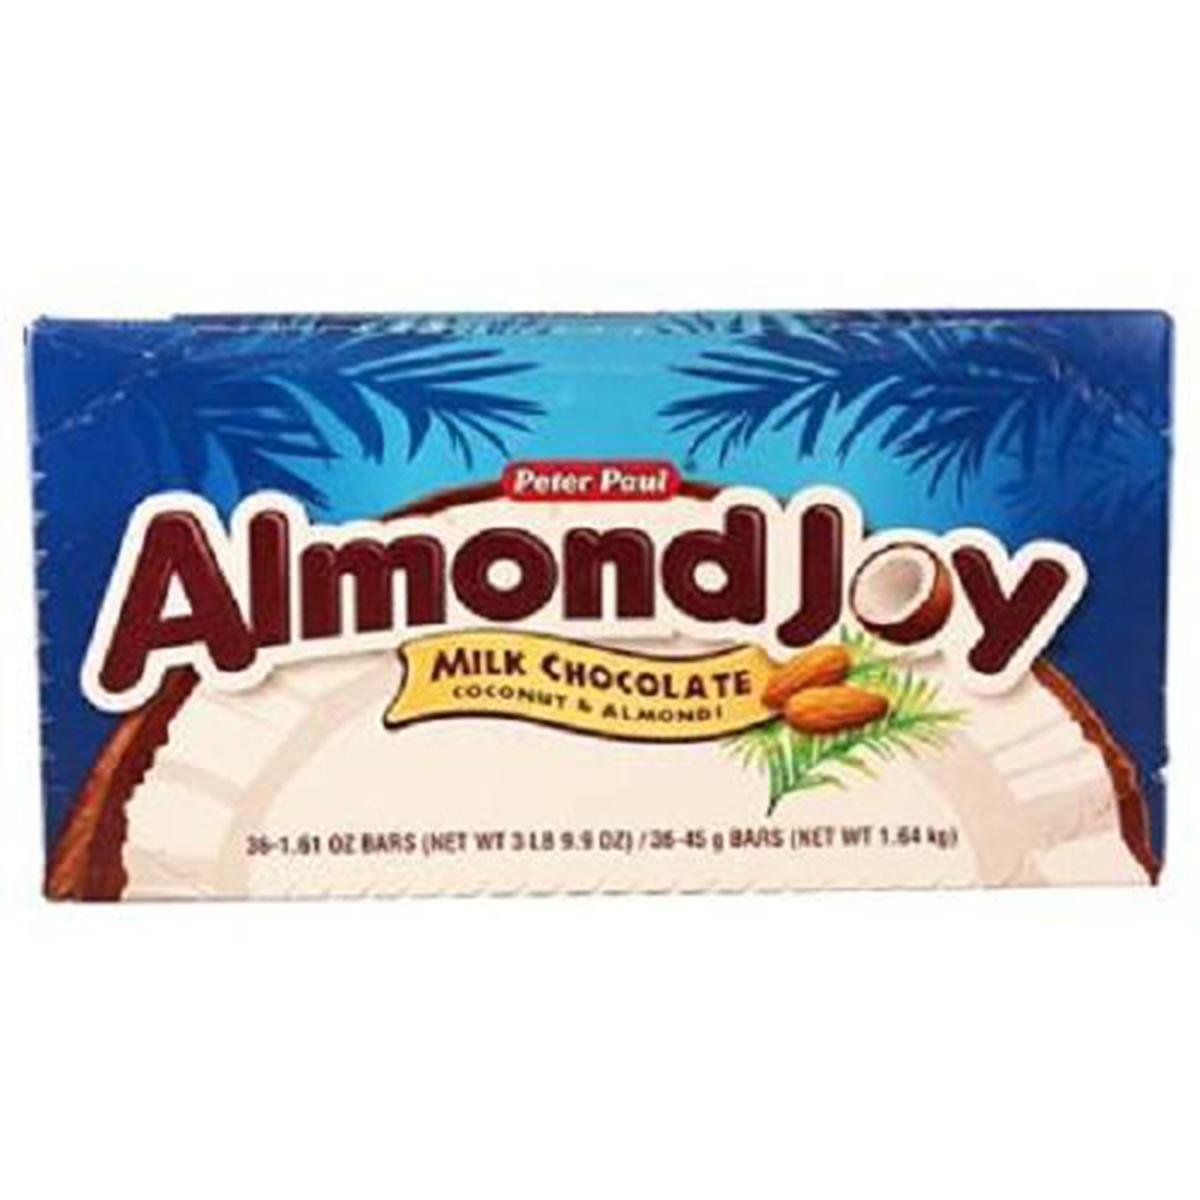 ALMOND JOY Candy Bar, (1.61-Ounce Bar, Pack of 36)